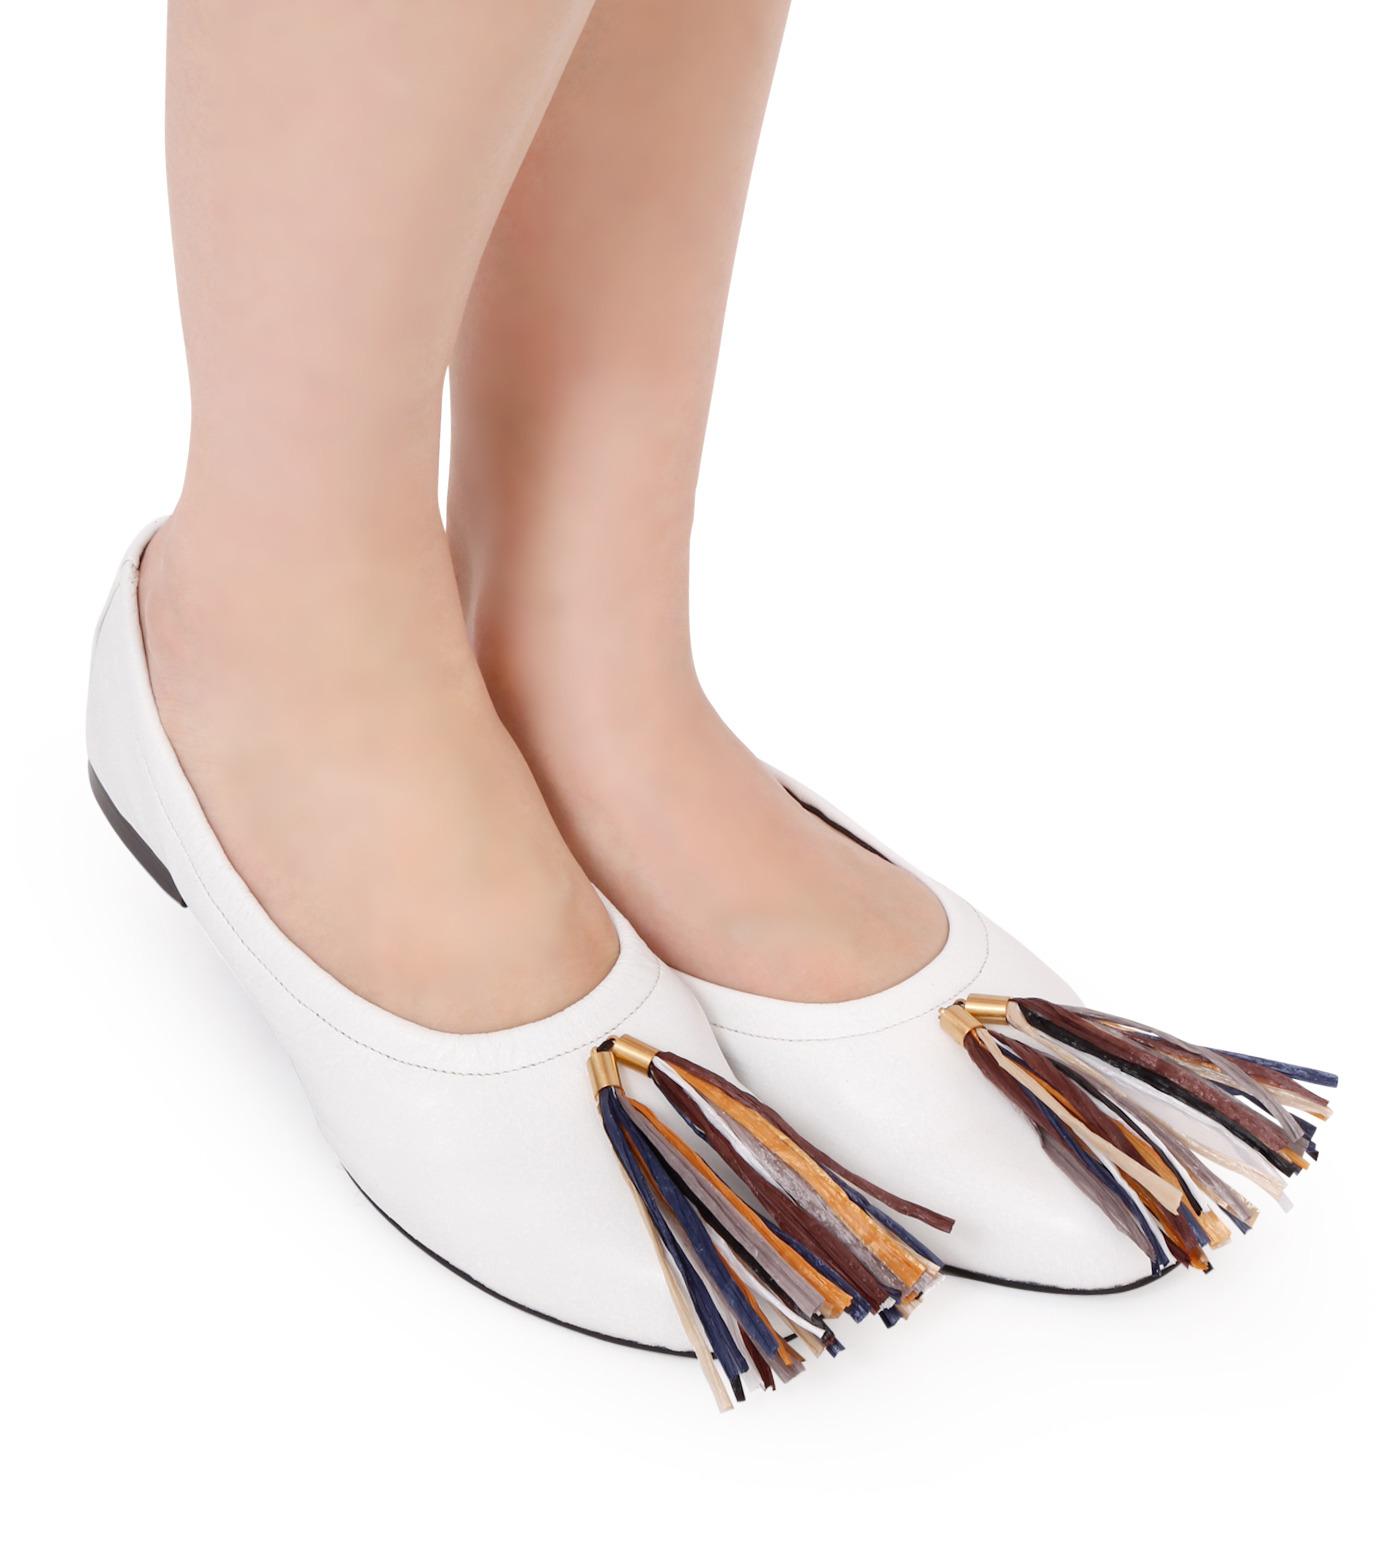 PIPPICHIC(ピッピシック)のballet shoes-WHITE(シューズ/shoes)-PP16BALLET19-4 拡大詳細画像5